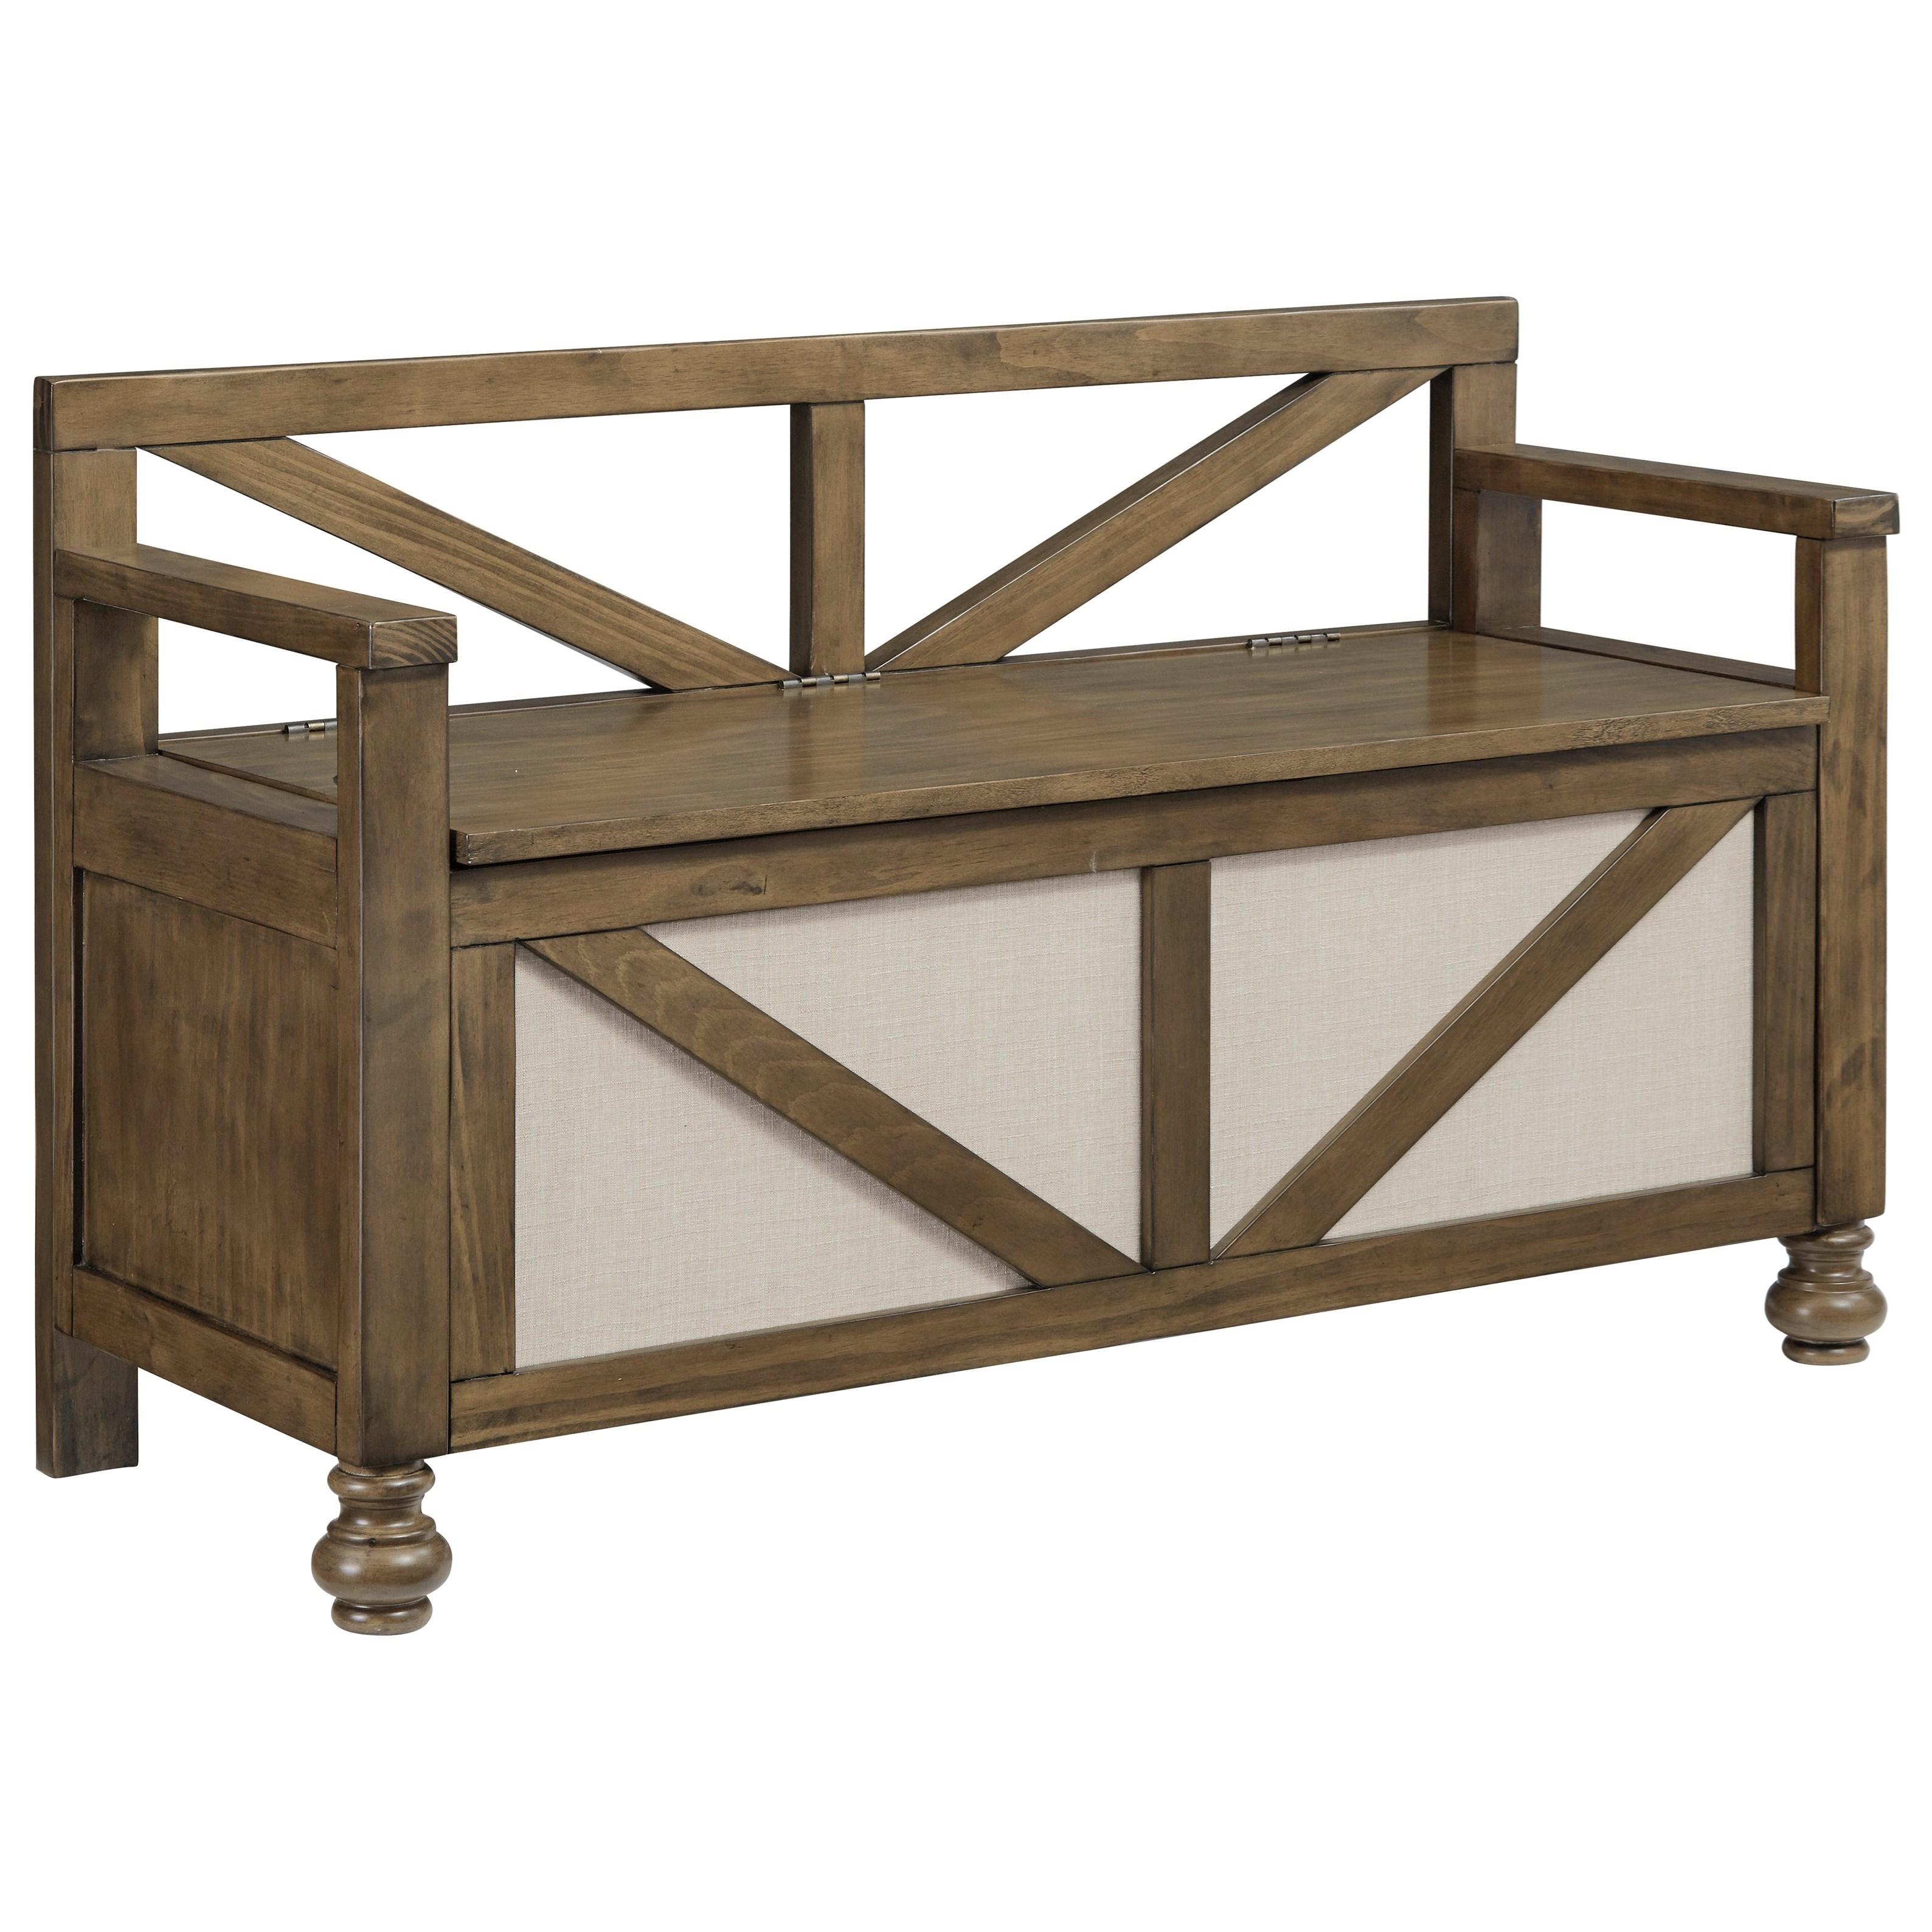 Farmhouse Storage Bench with Lift Seat